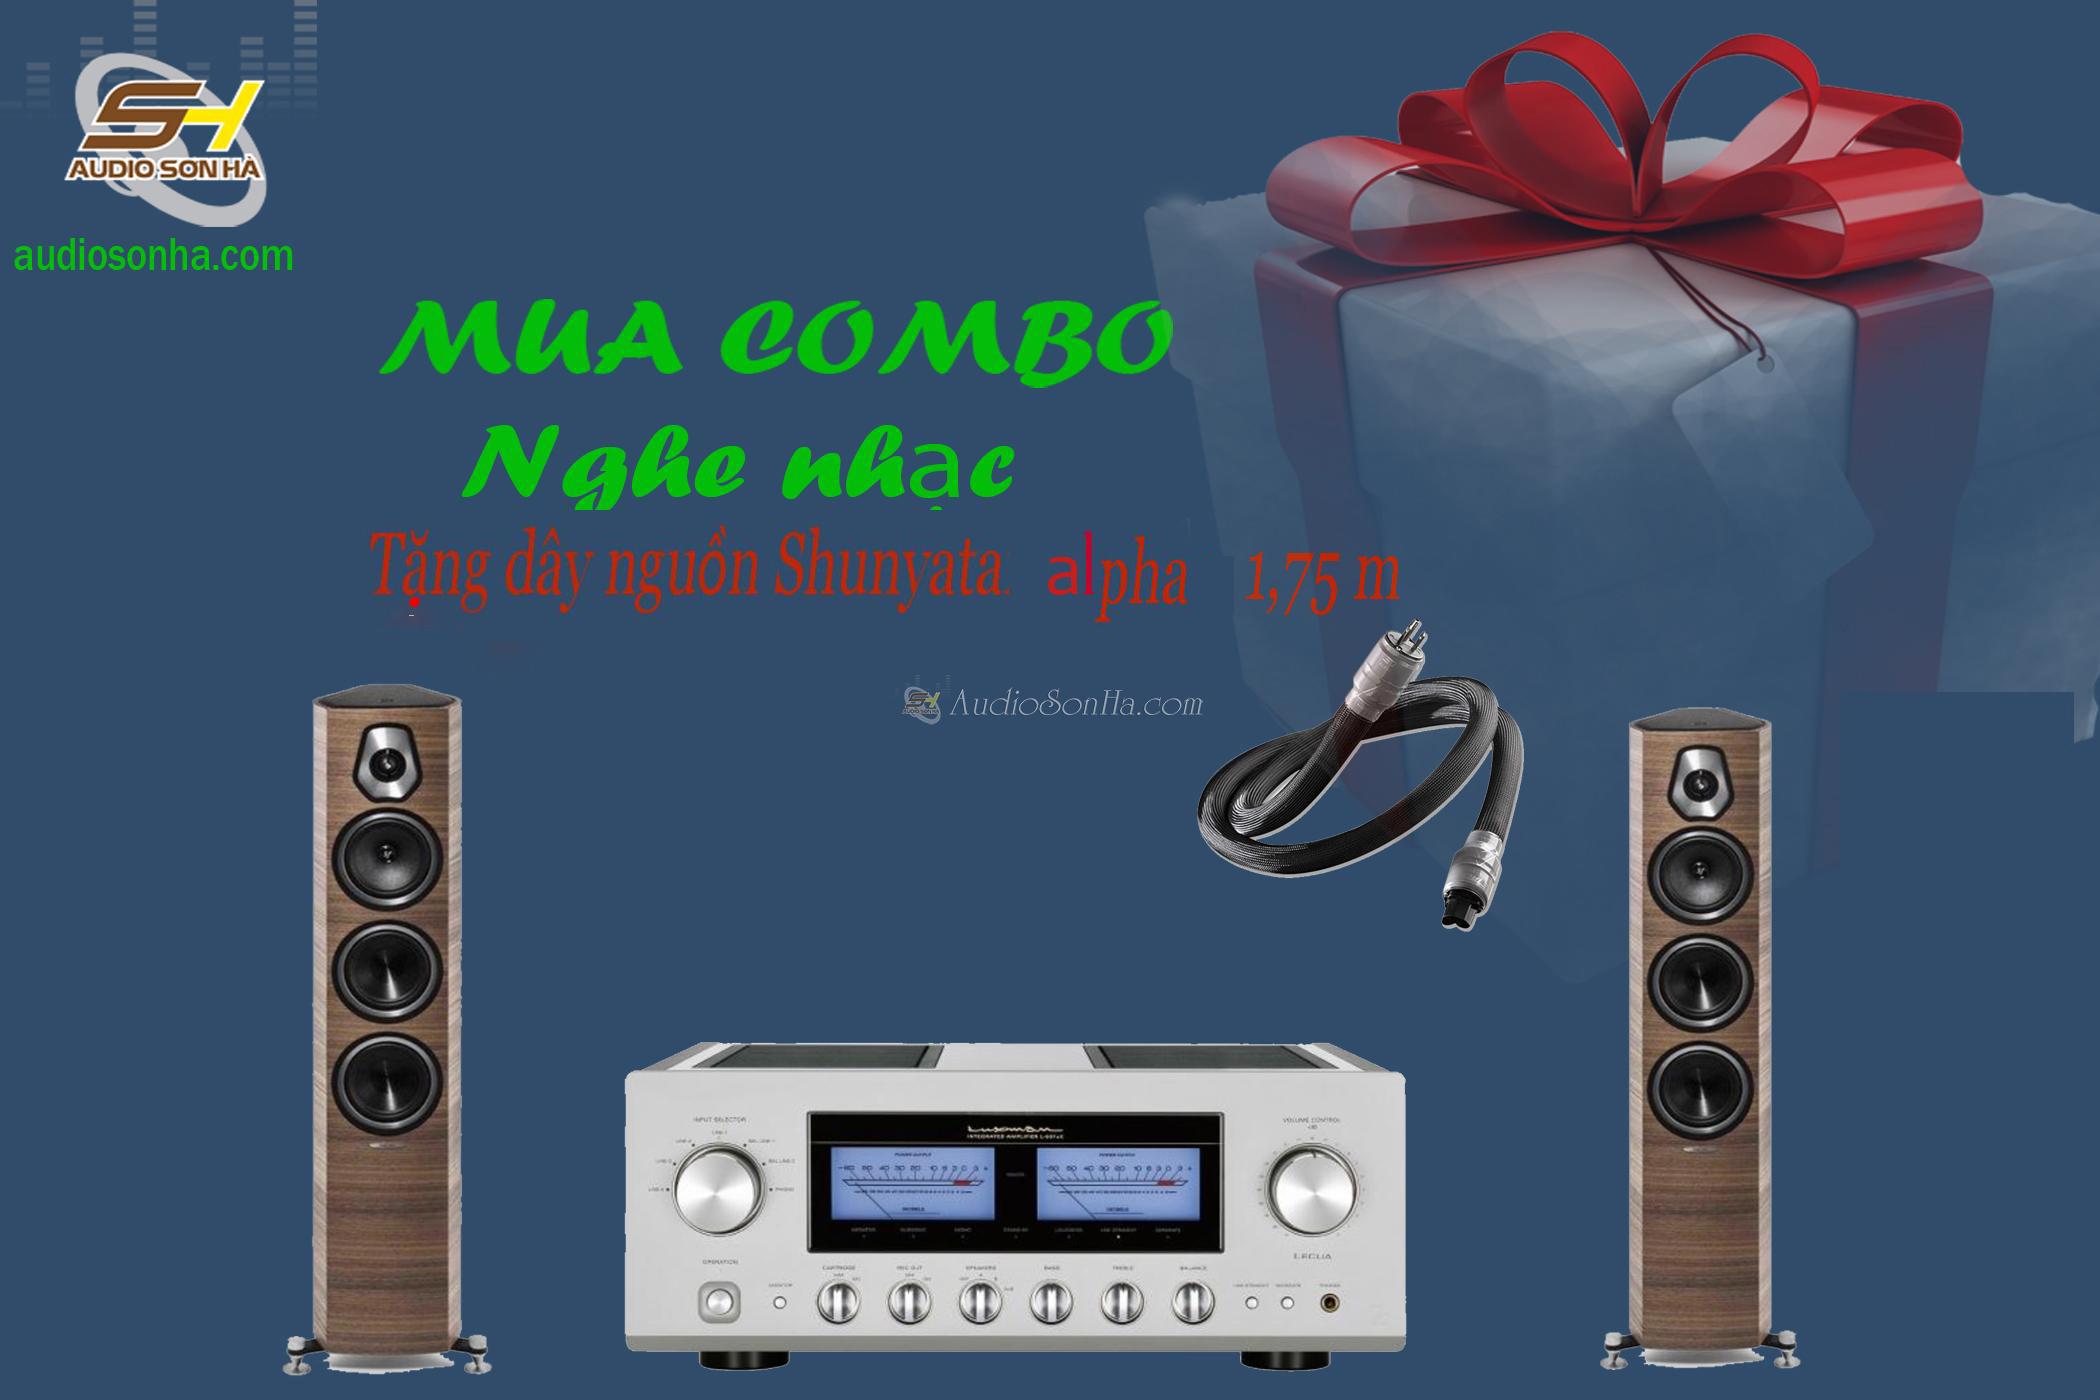 Hệ thống nghe nhạc Amplifier Luxman L- 507UX / Sonus Faber SonettoIII